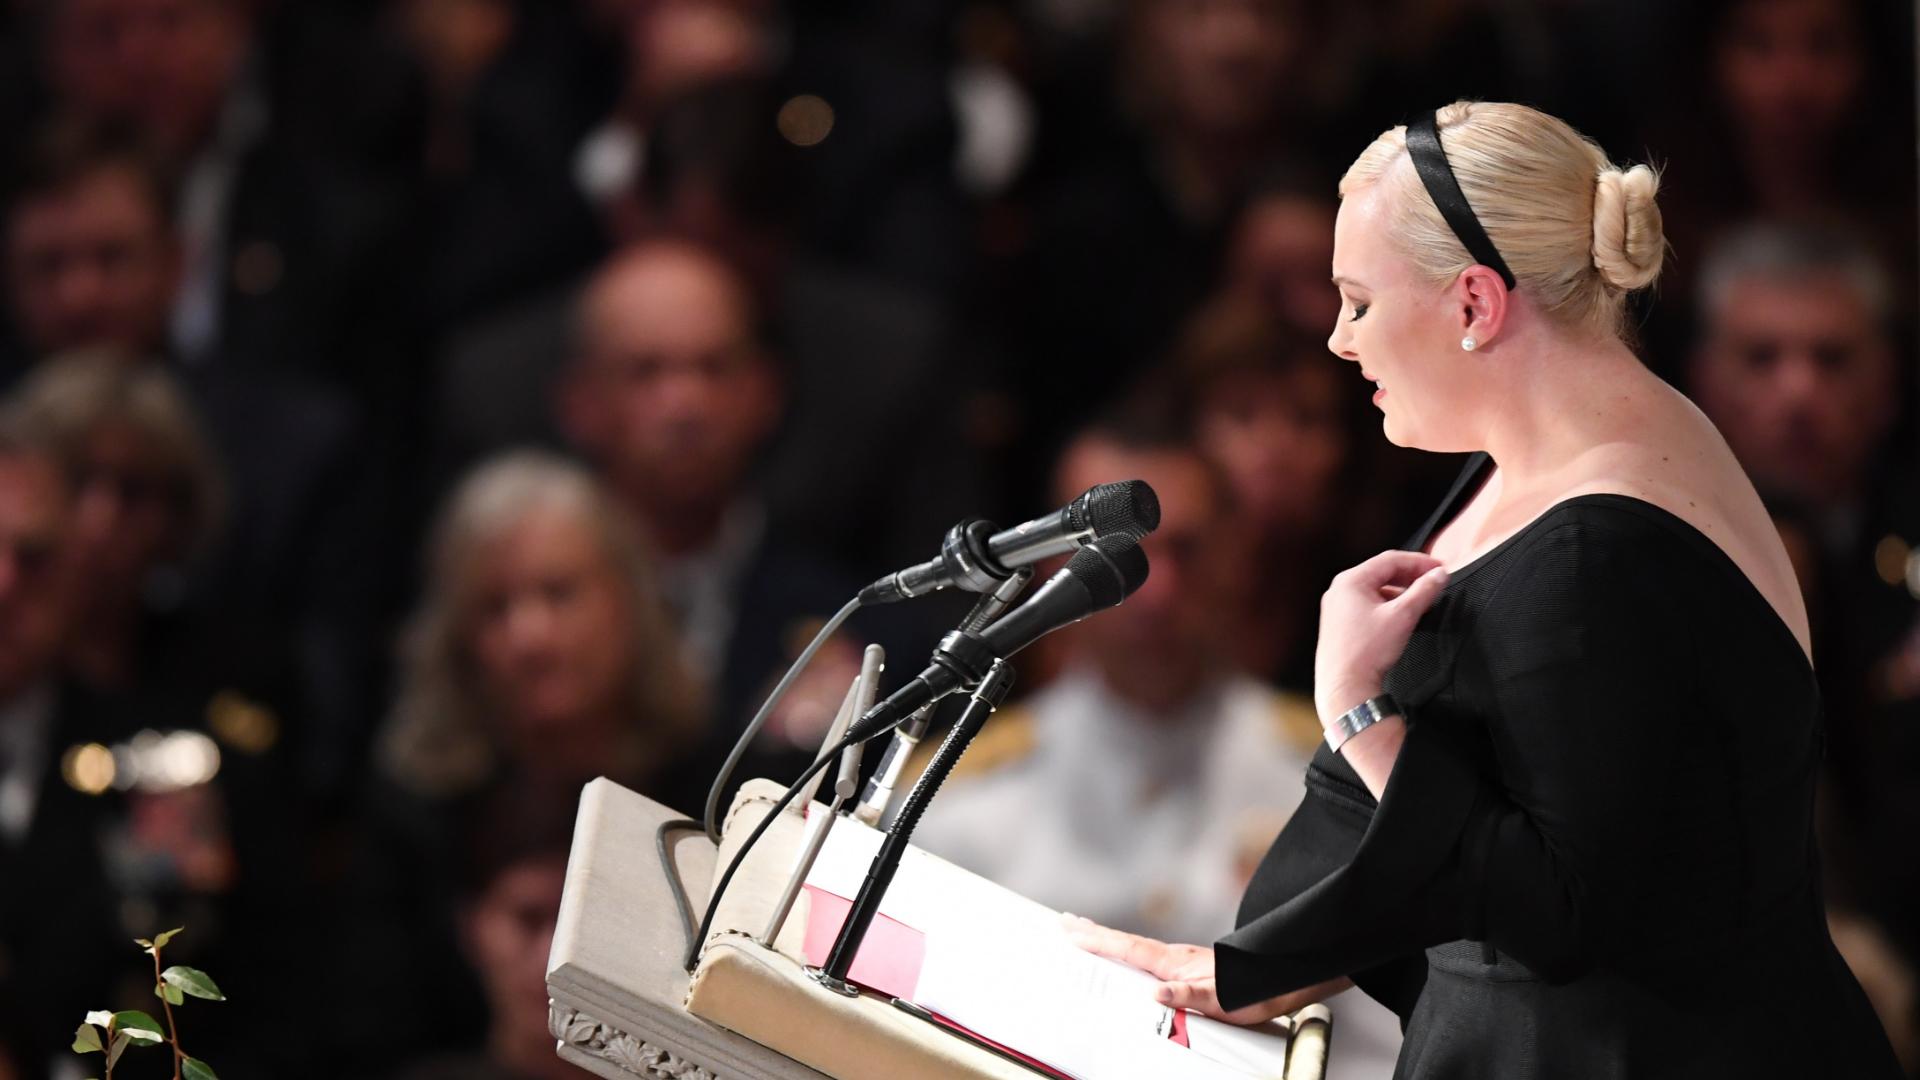 A 'pathetic life': Meghan McCain escalates her pushback against Trump